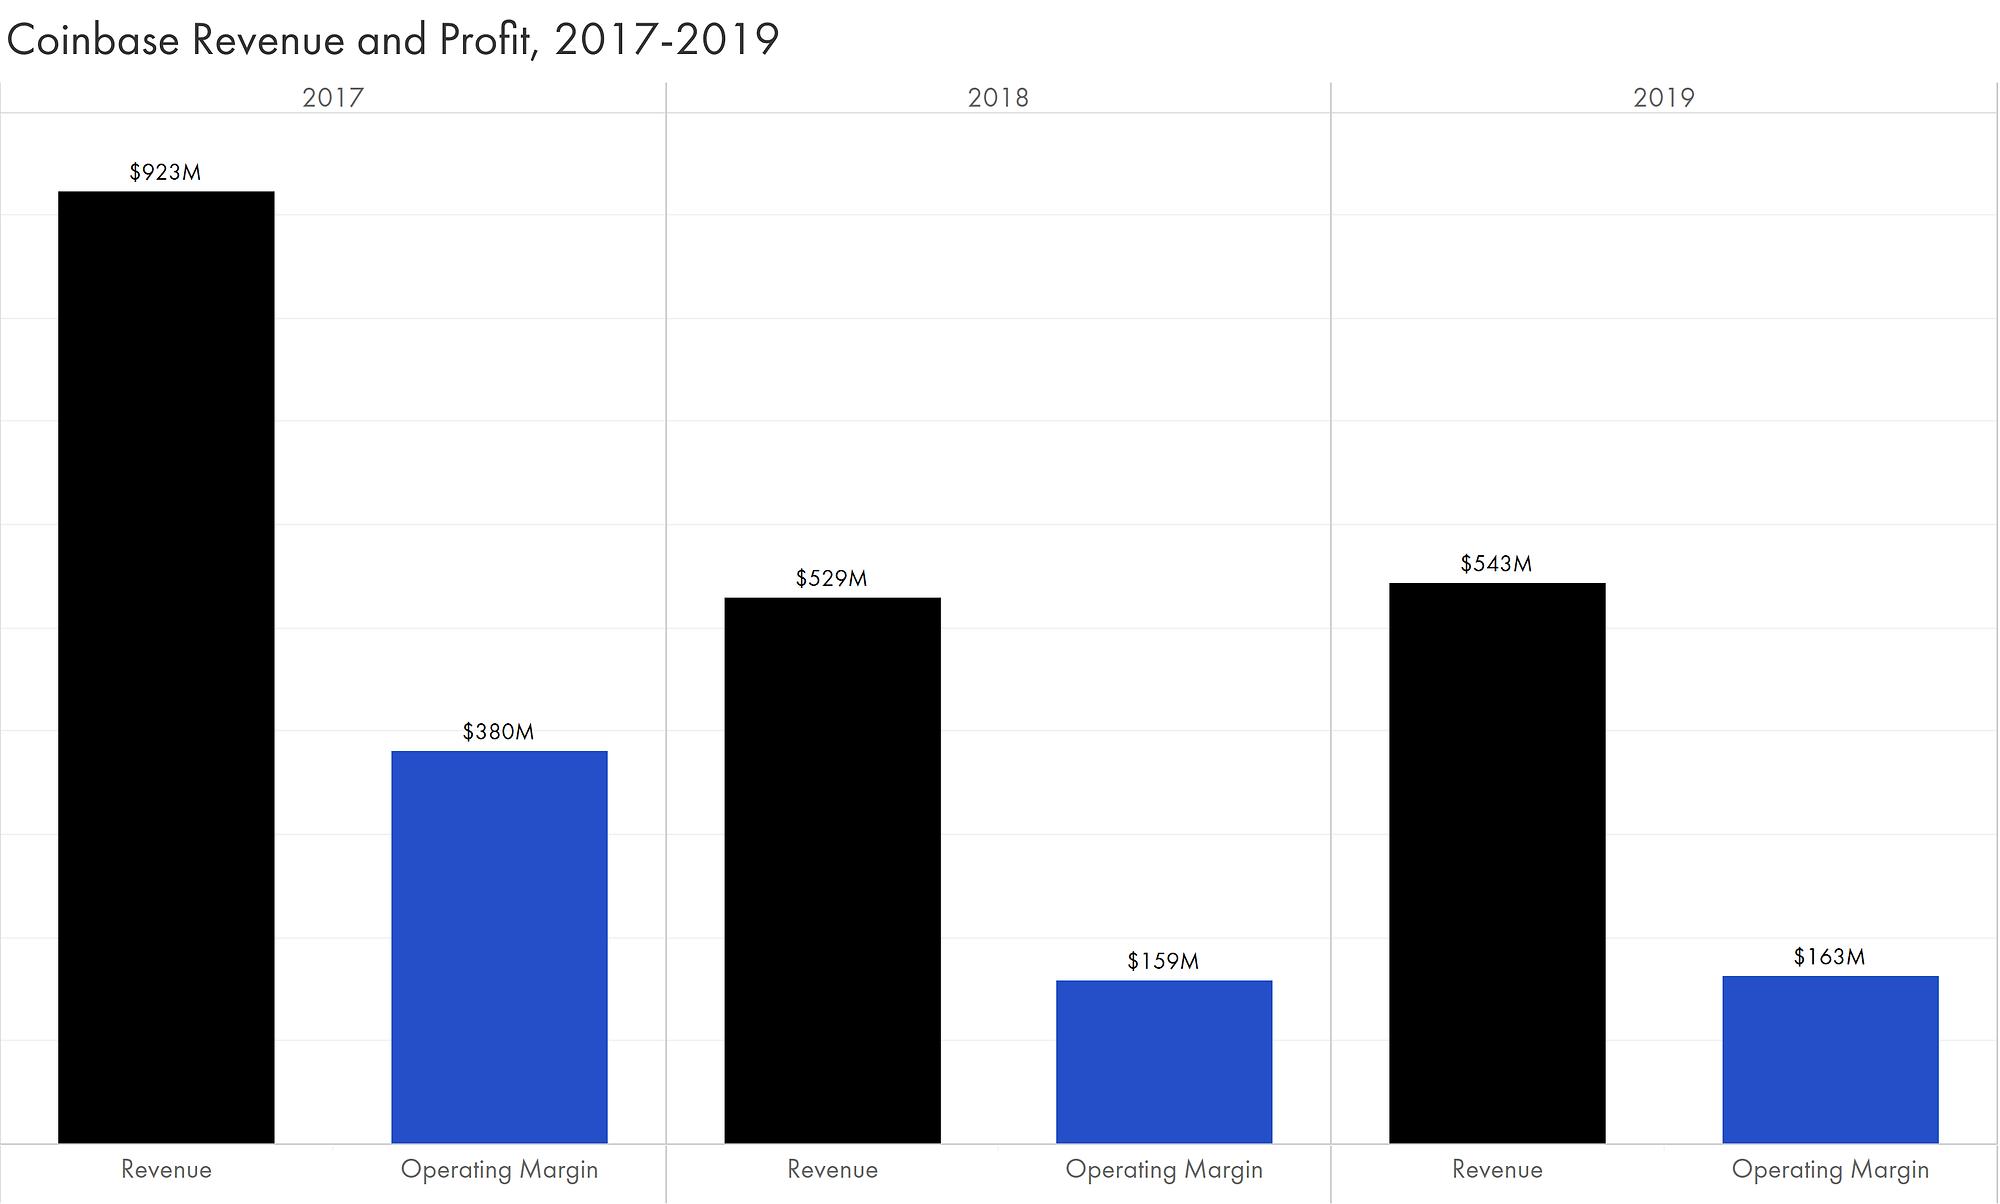 Sale > new balance revenue 2018 > is stock